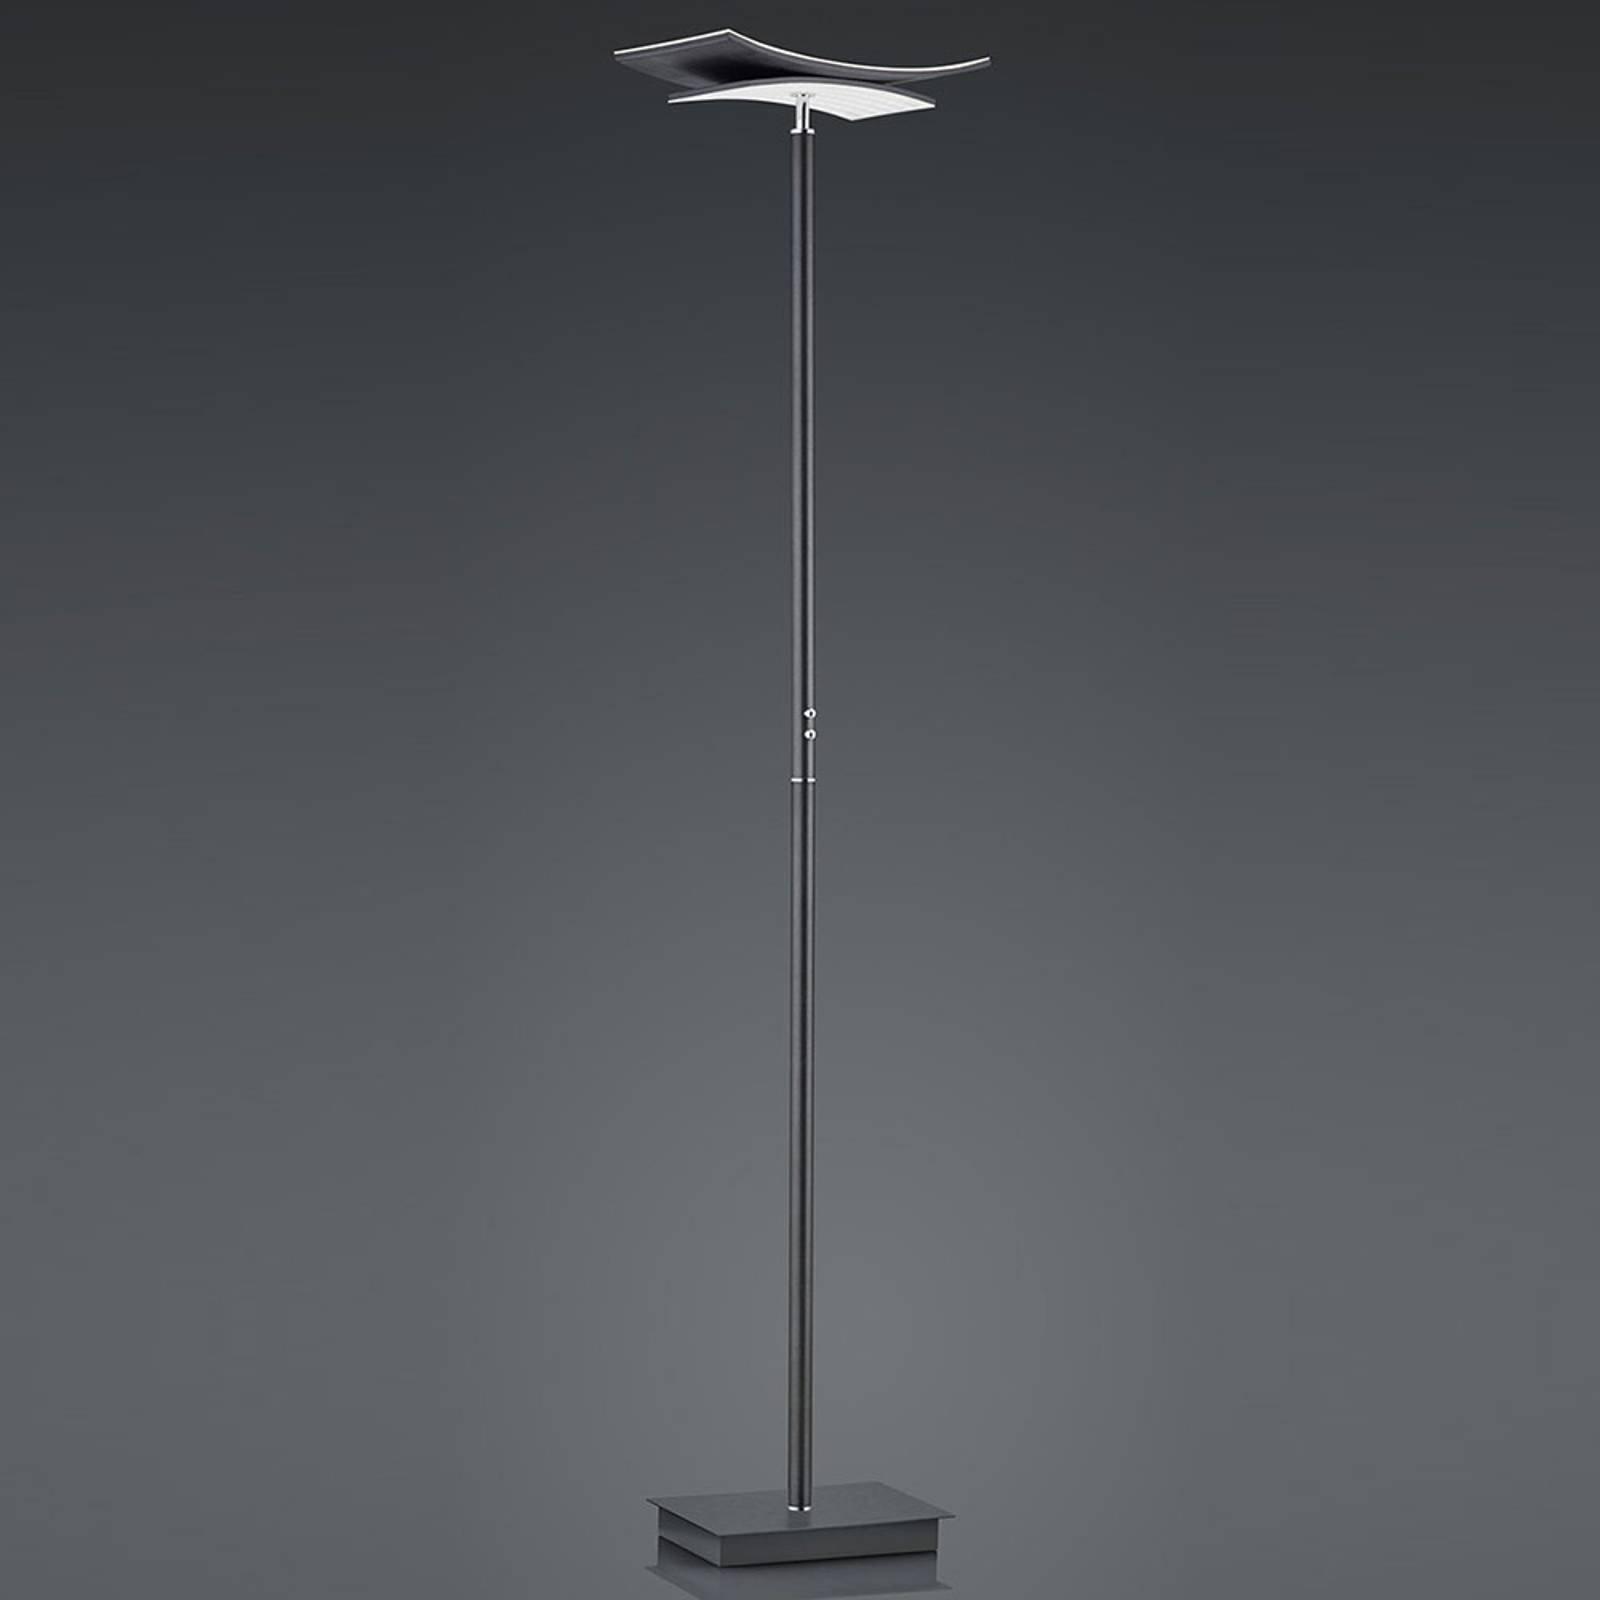 B-Leuchten Liberty LED-gulvlampe, antrasitt